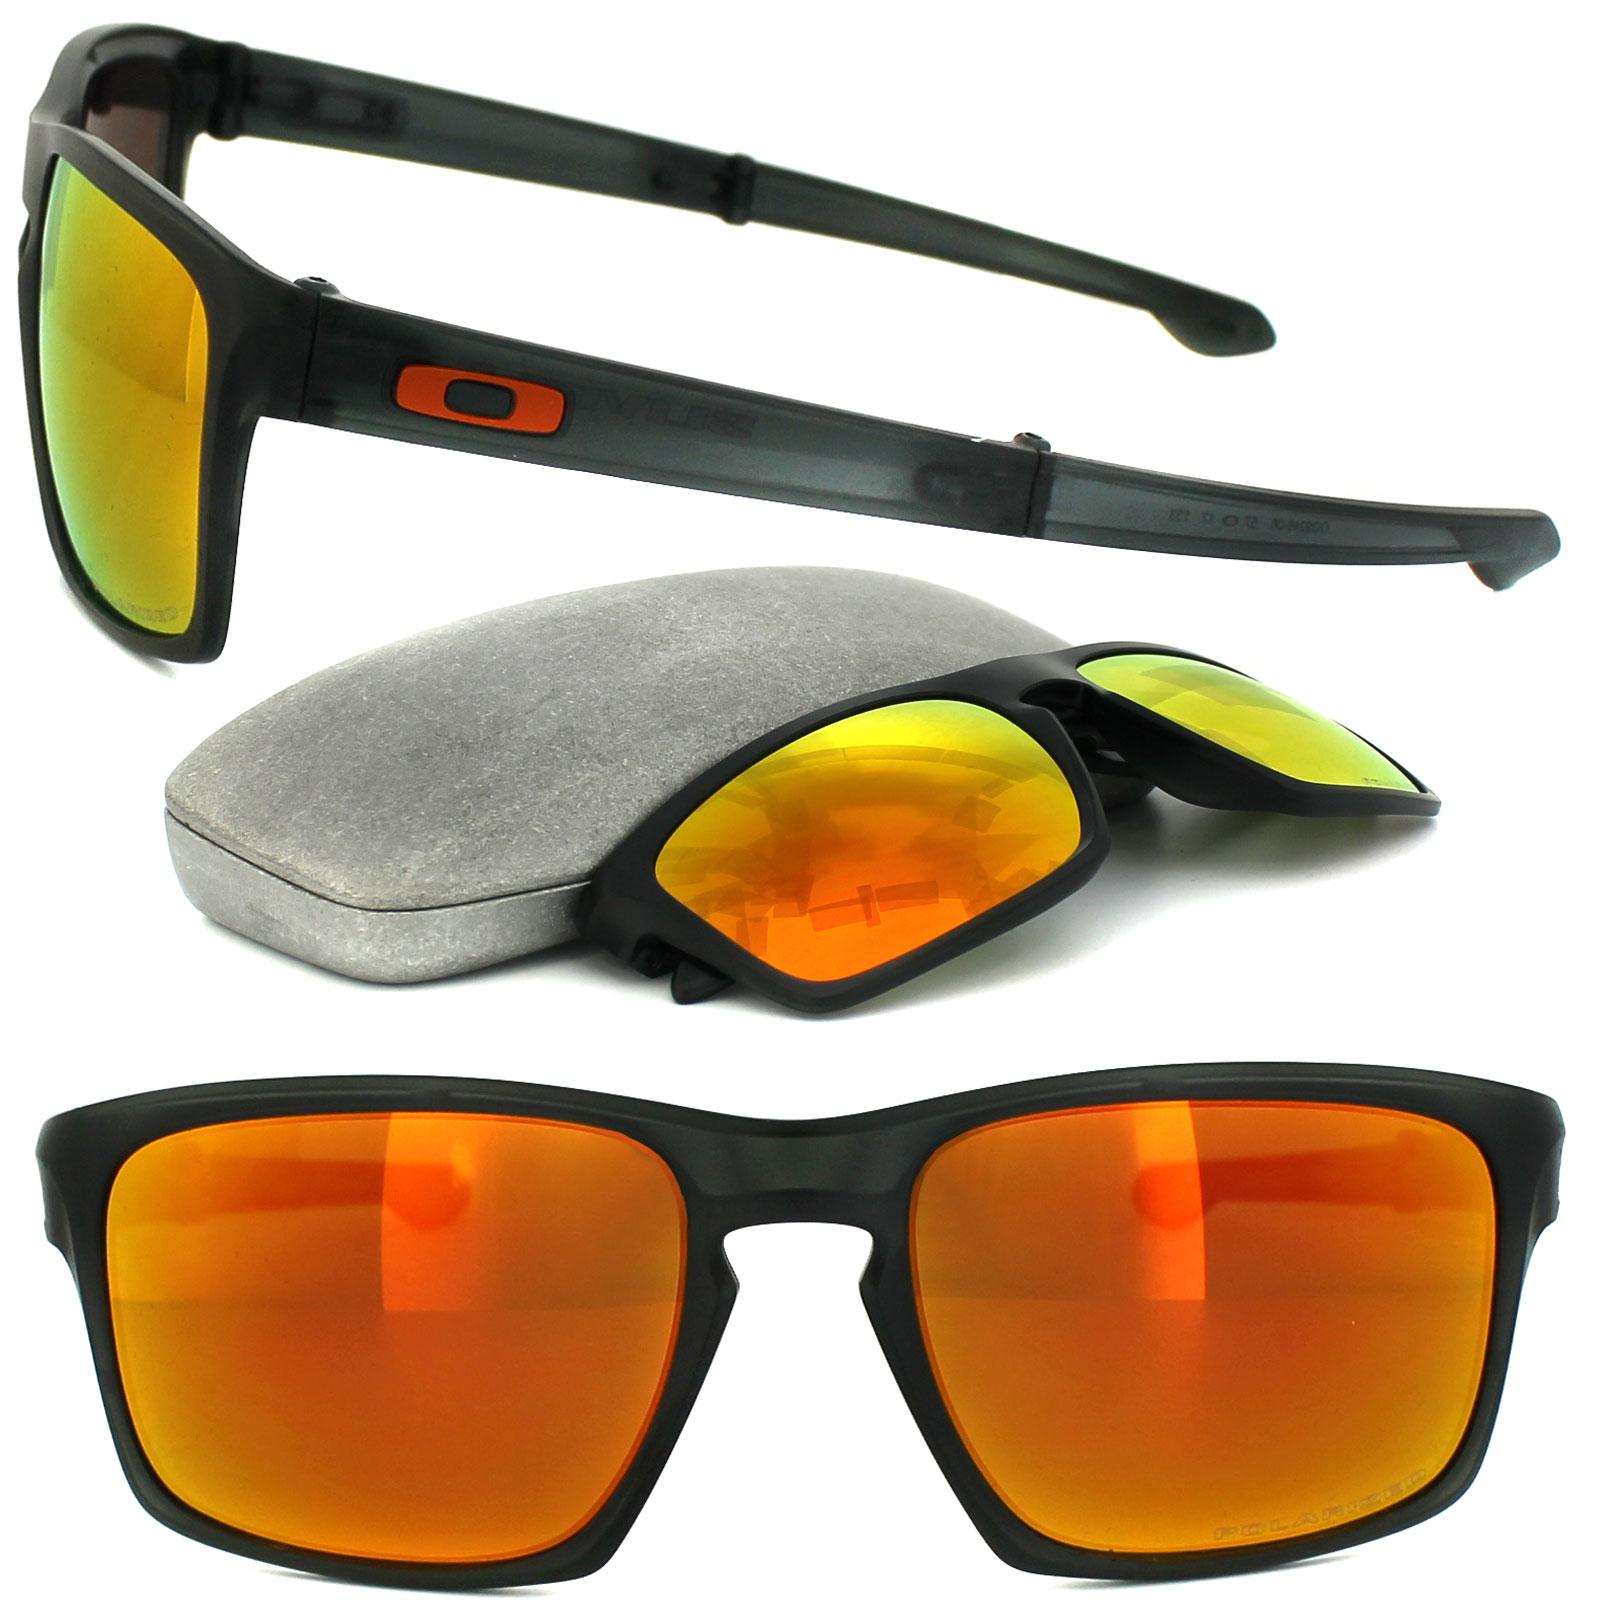 7d4d5c9a657 Oakley Sliver F Polarized Sunglasses « Heritage Malta